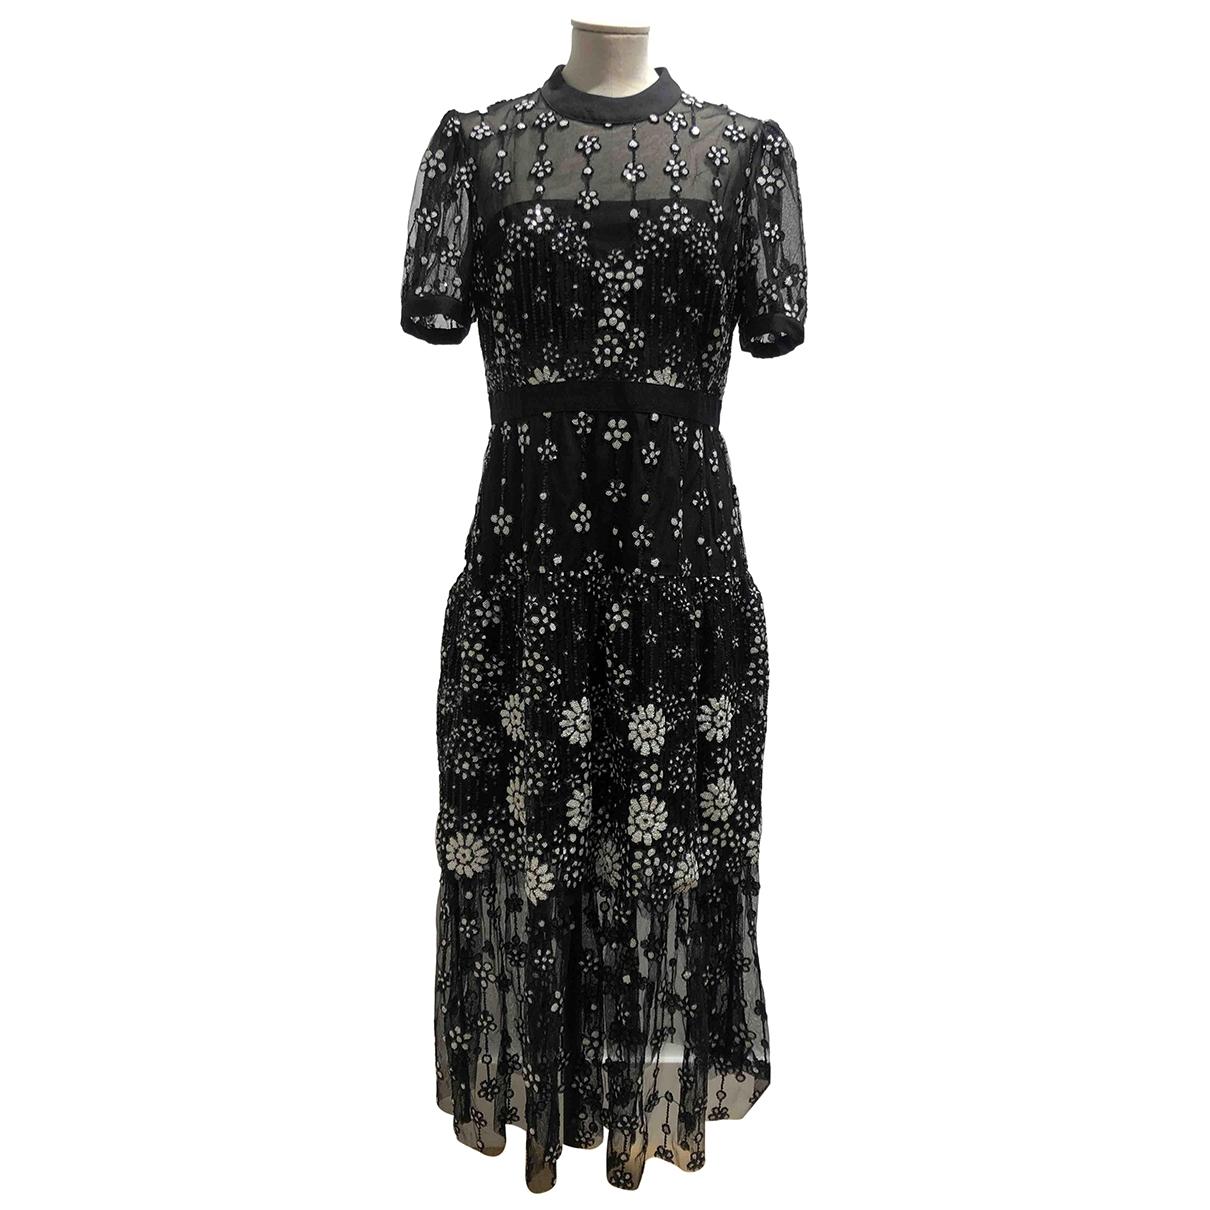 Self Portrait \N Black dress for Women 12 UK